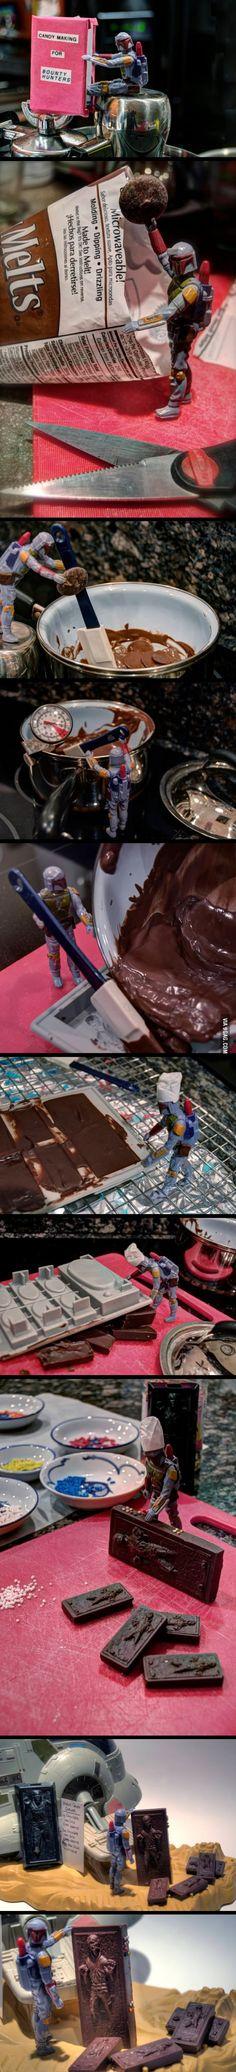 Boba Fett making chocolate Han Solos